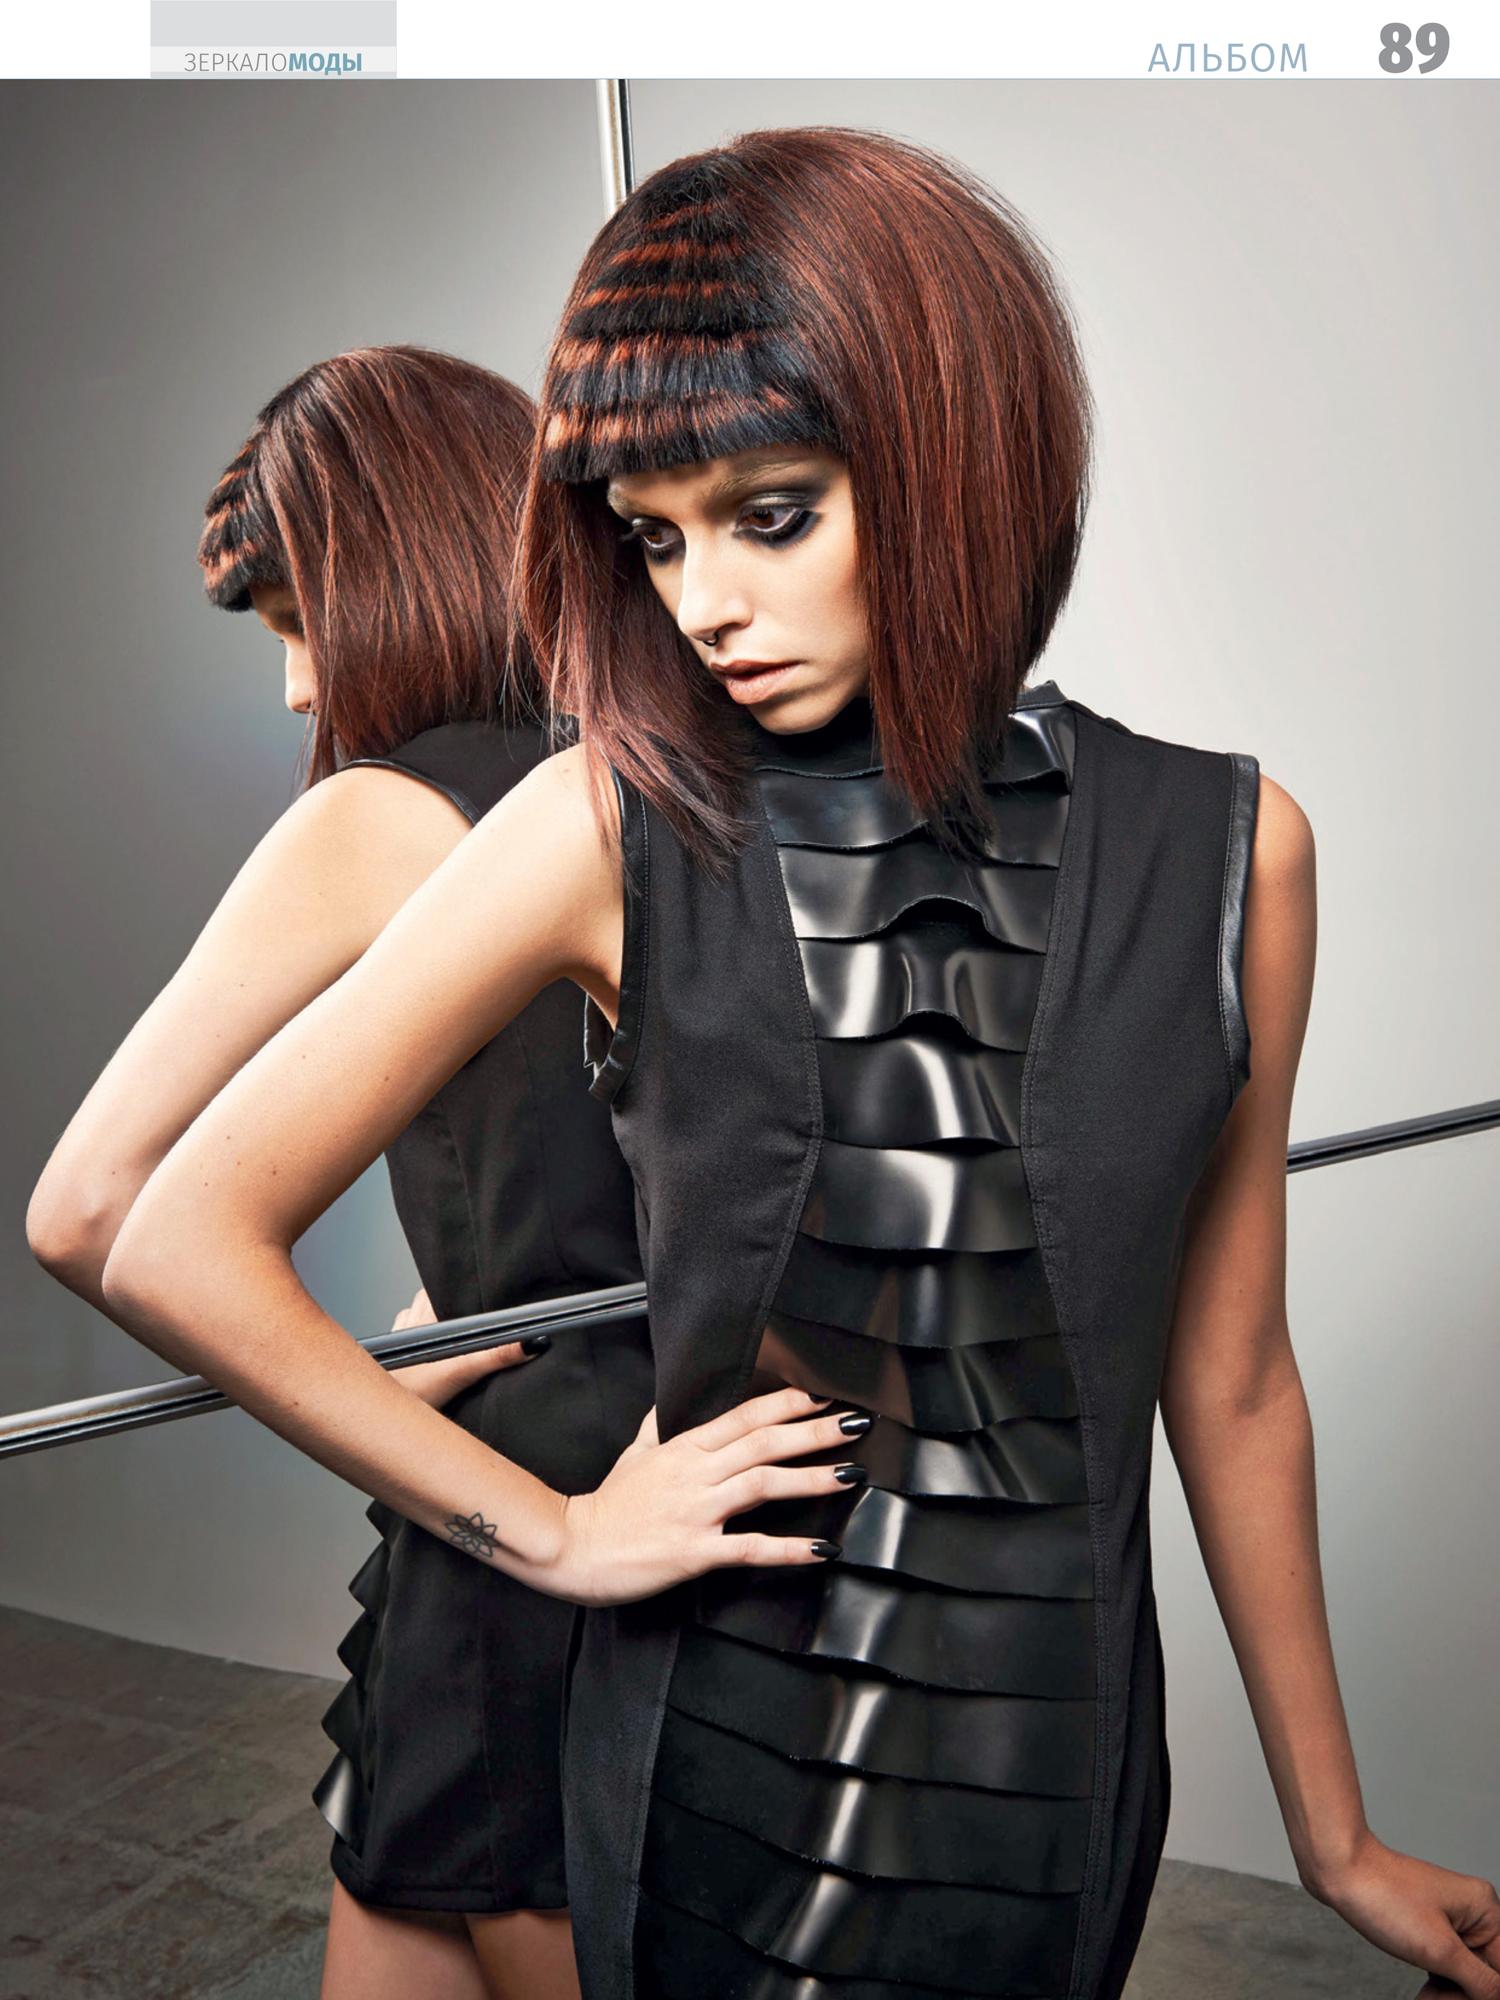 yoshikohair_stkilda_melbourne_hairdresser_hairsalon_zm17_4